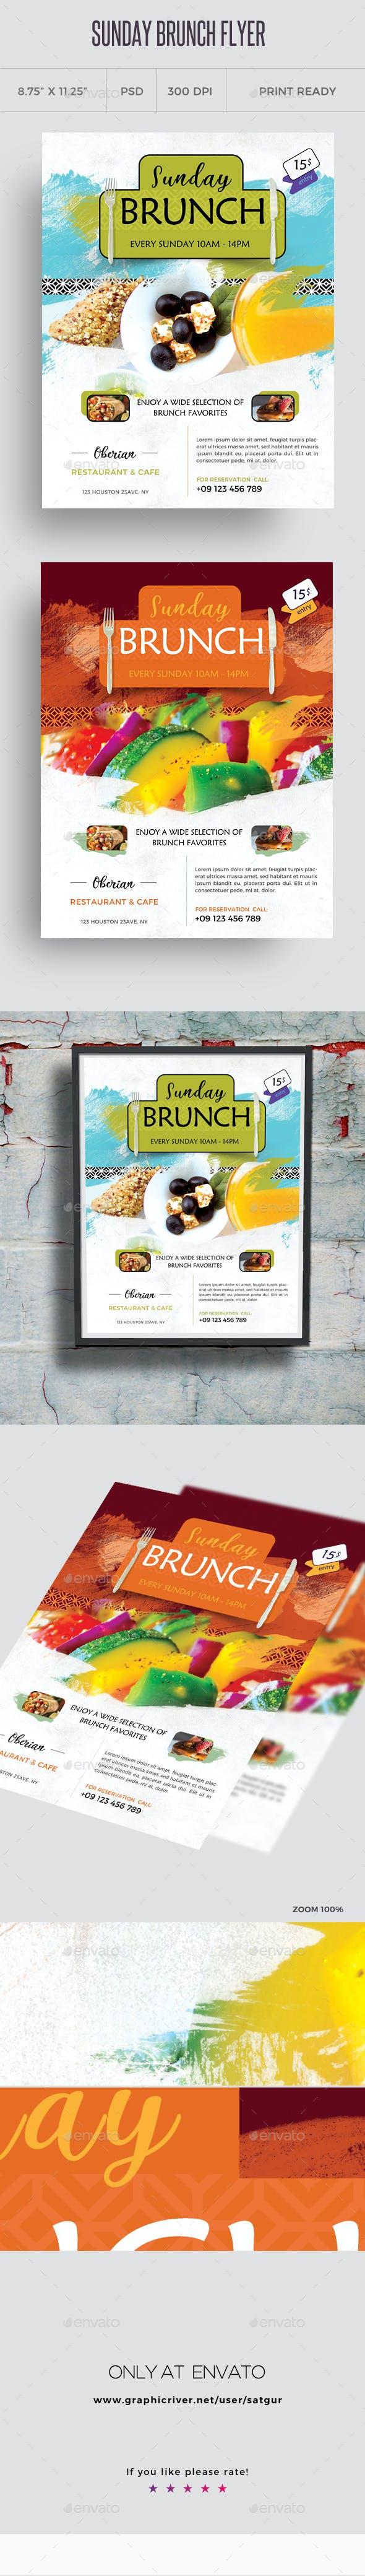 sunday brunch flyer template by satgur graphicriver